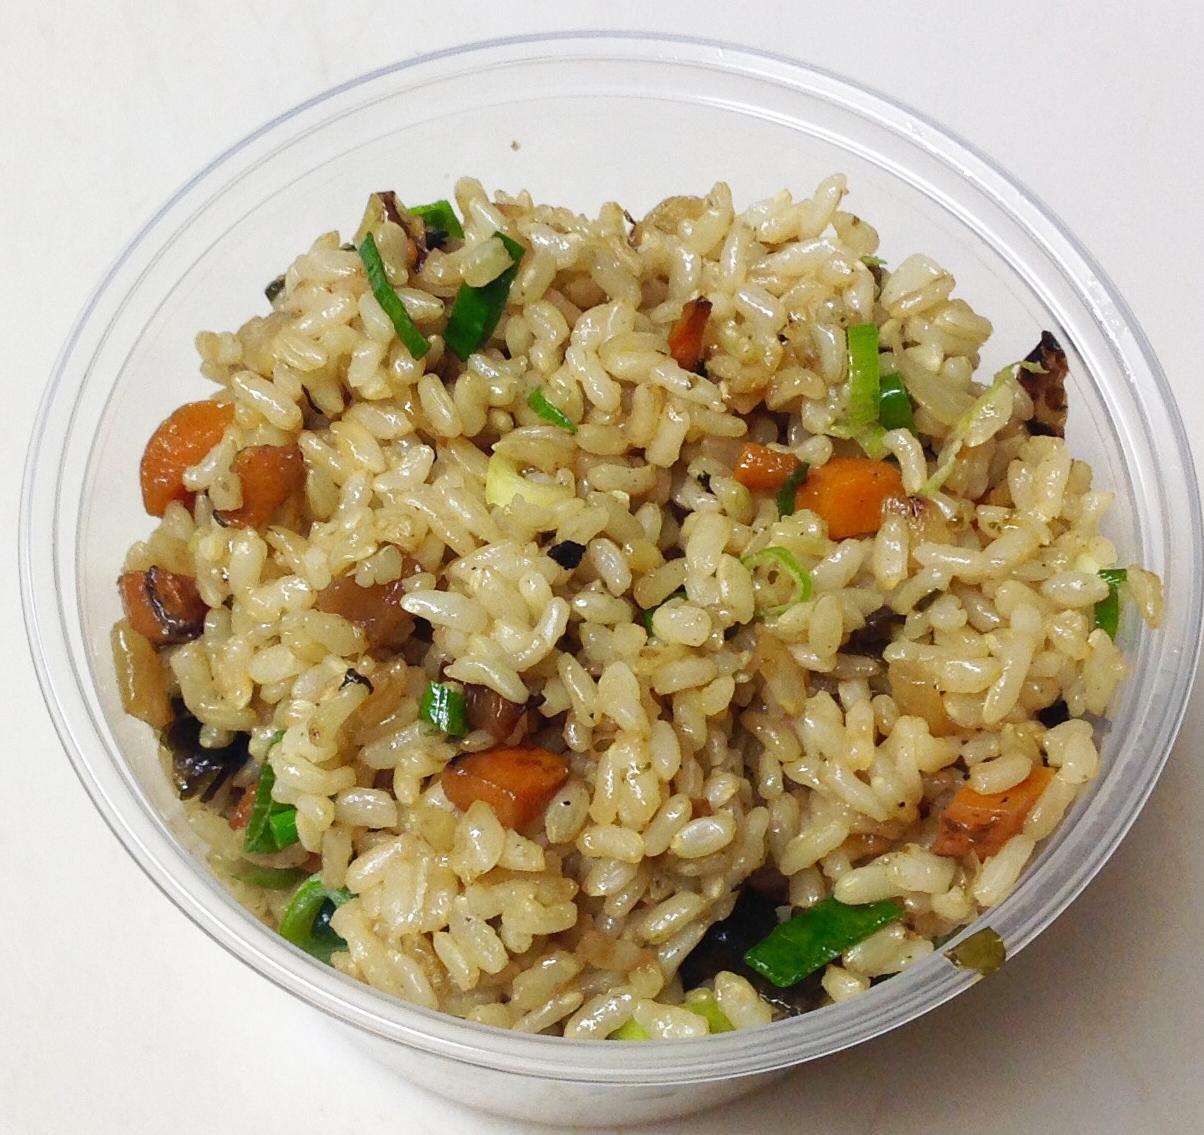 stir fried brown rice